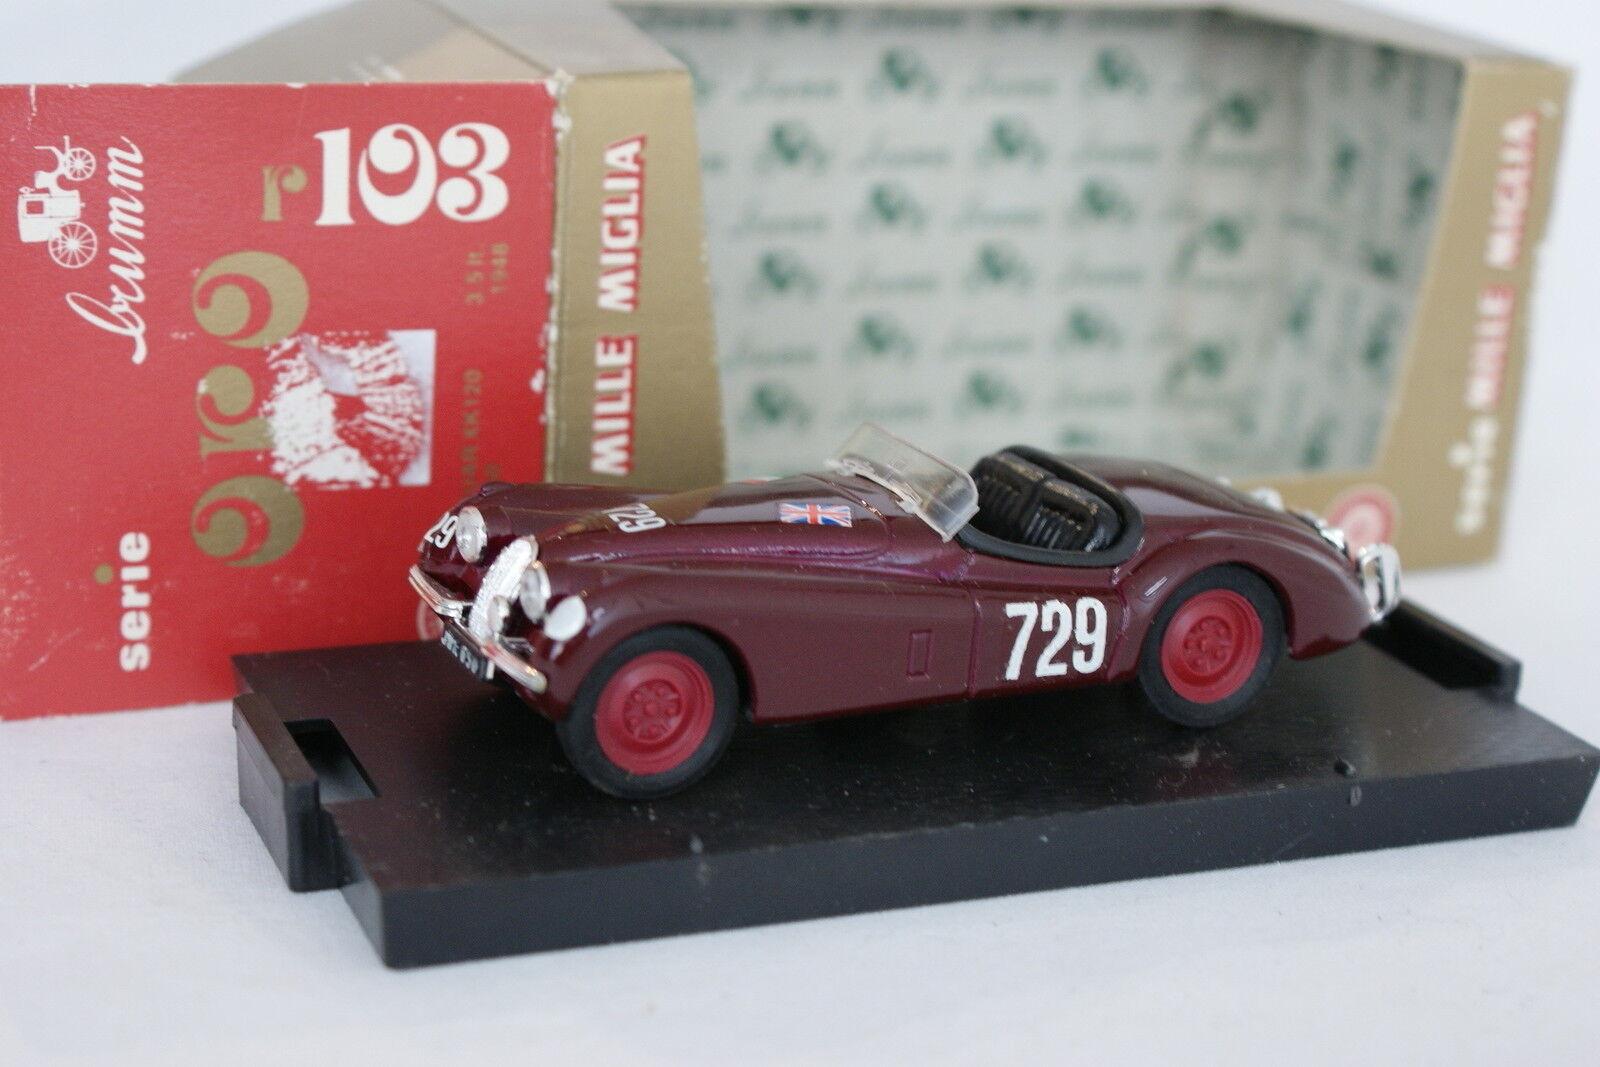 Brumm 1 43 - Jaguar XK 120 Spider Mille Miglia 1950 (old box)